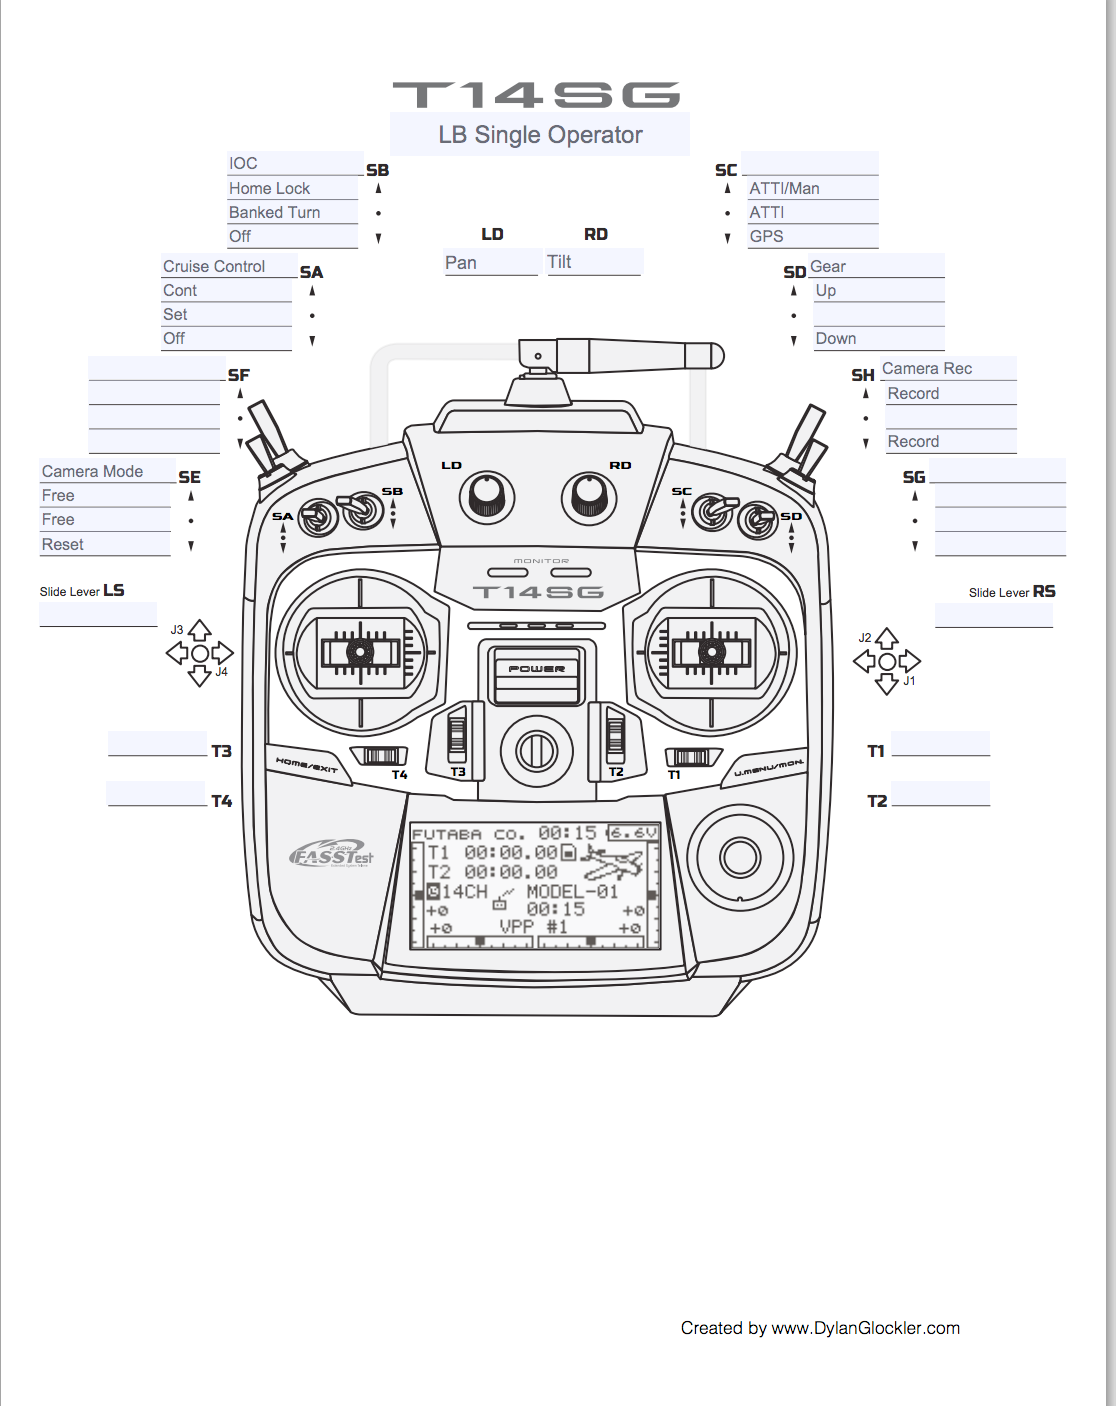 futaba dji wiring diagram